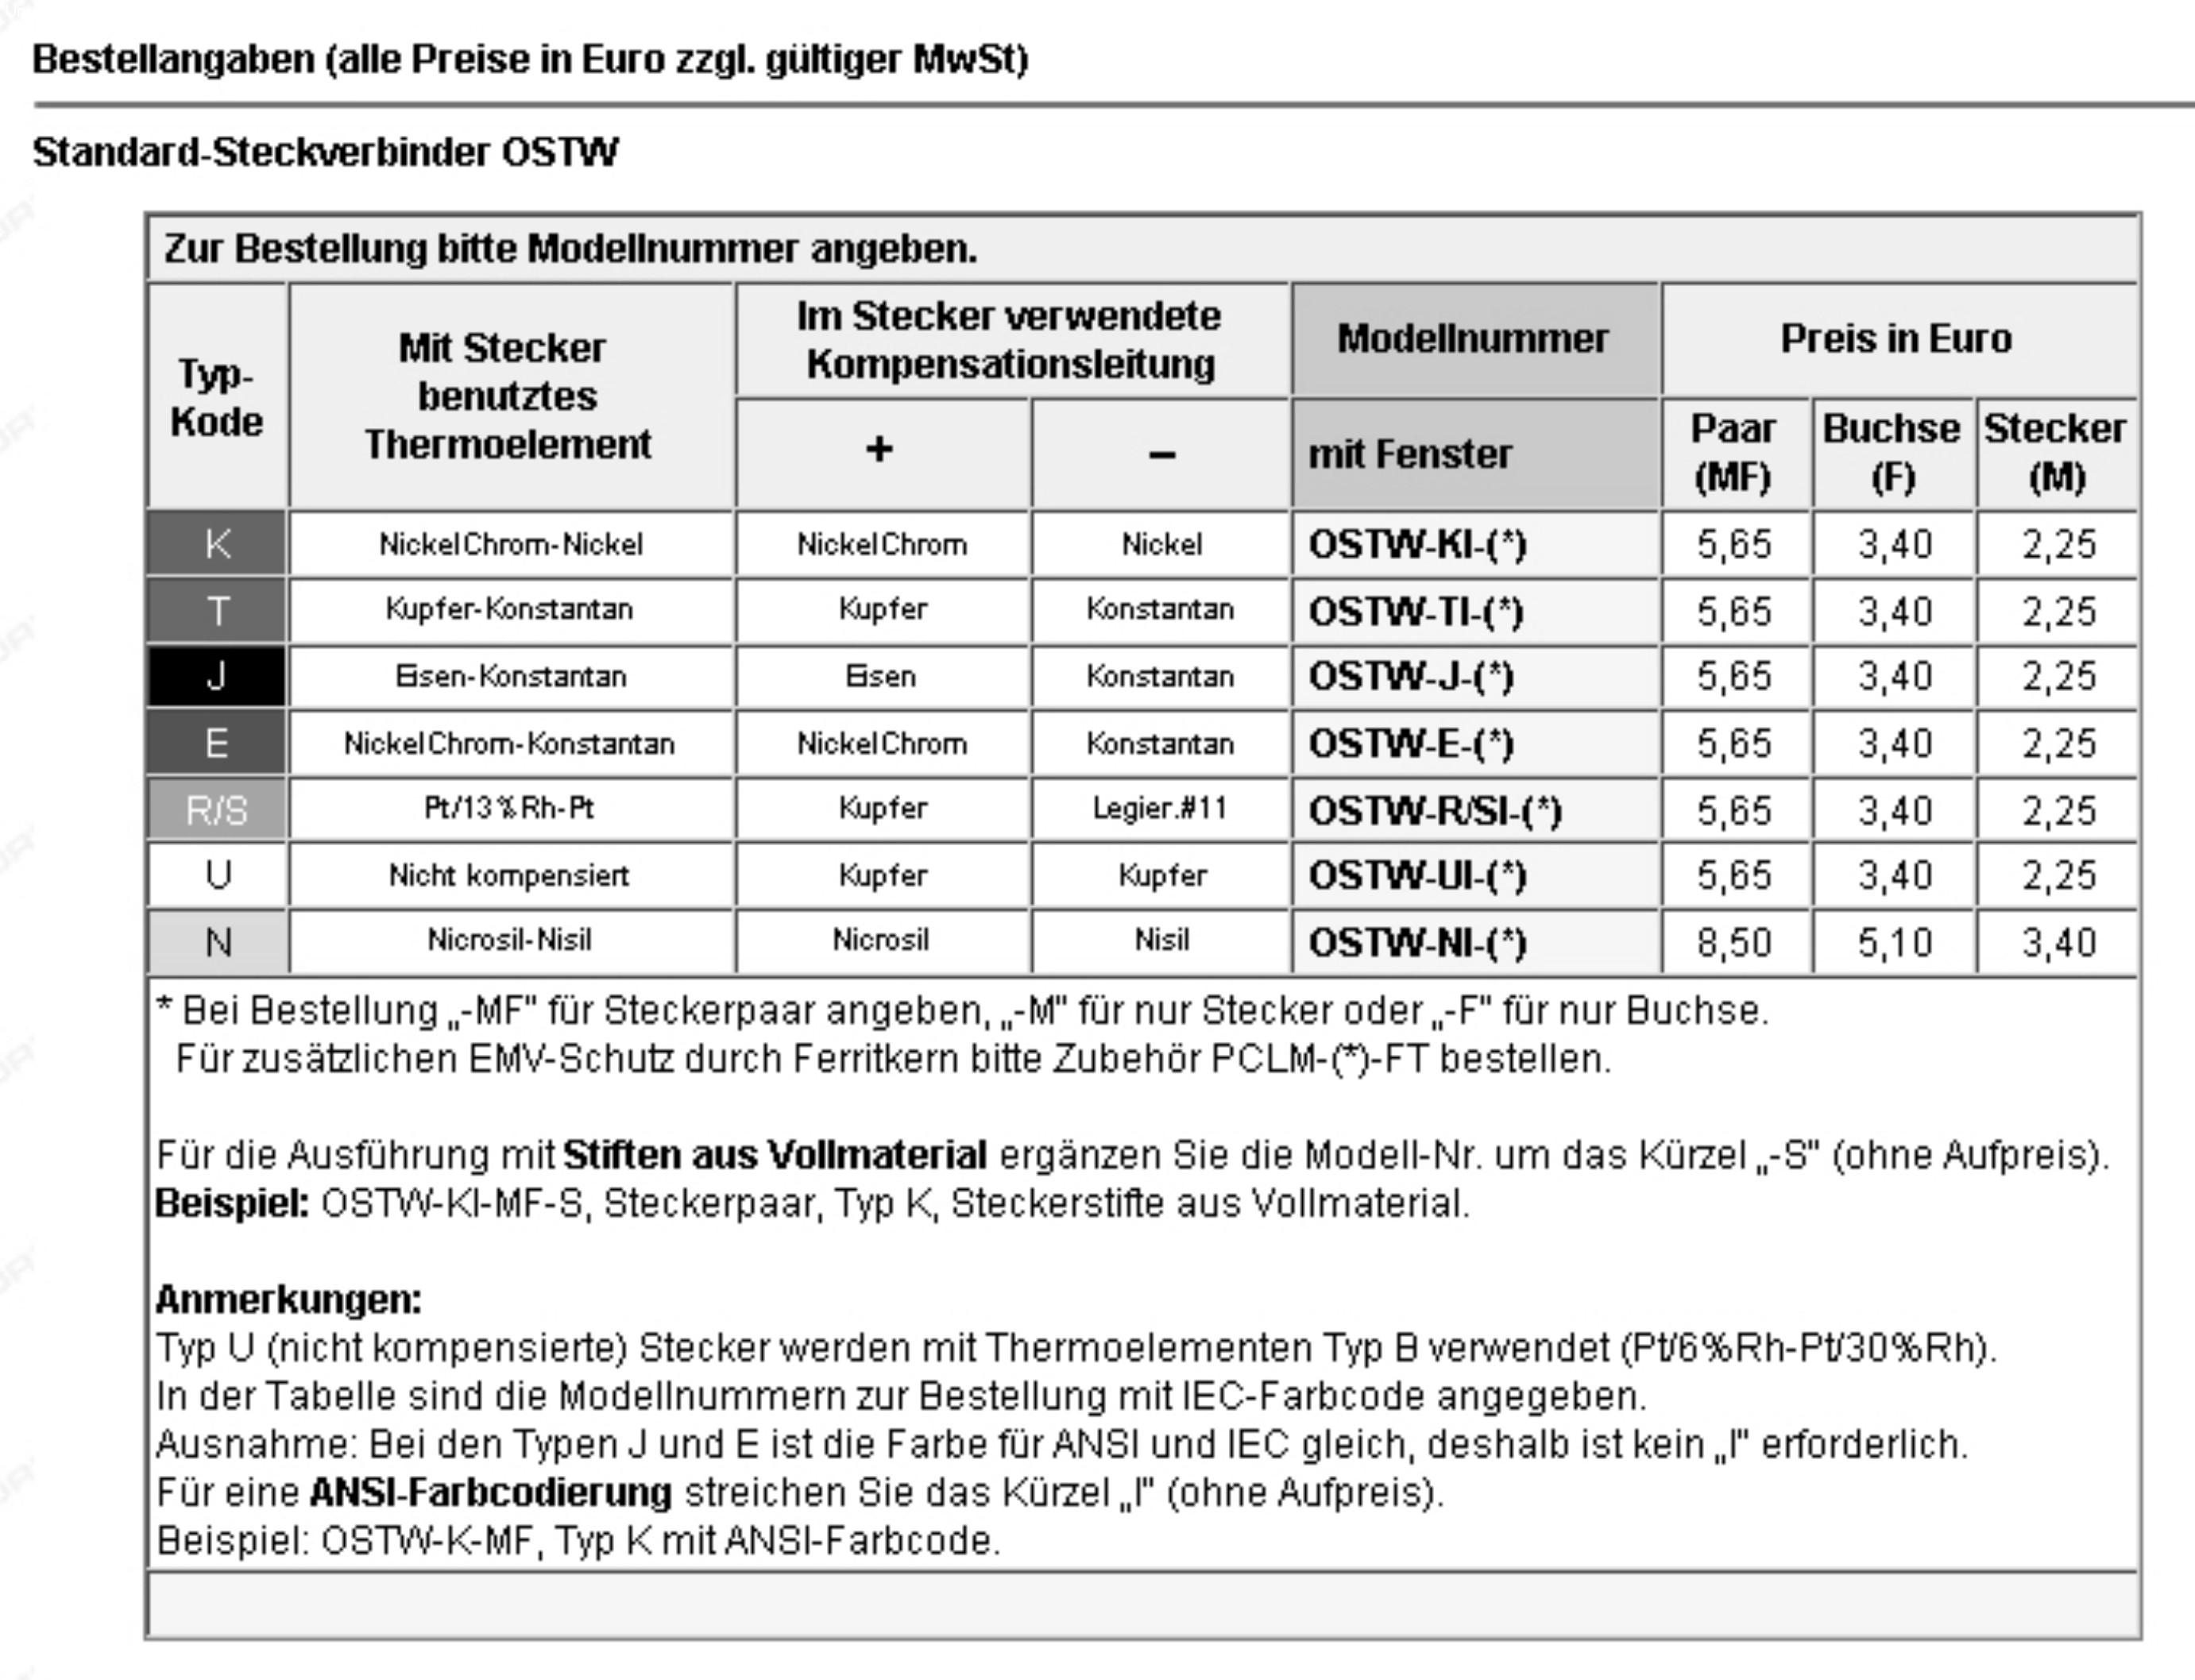 S.-Stecker - Temperature Products GmbH - UNREGISTERED VERSION